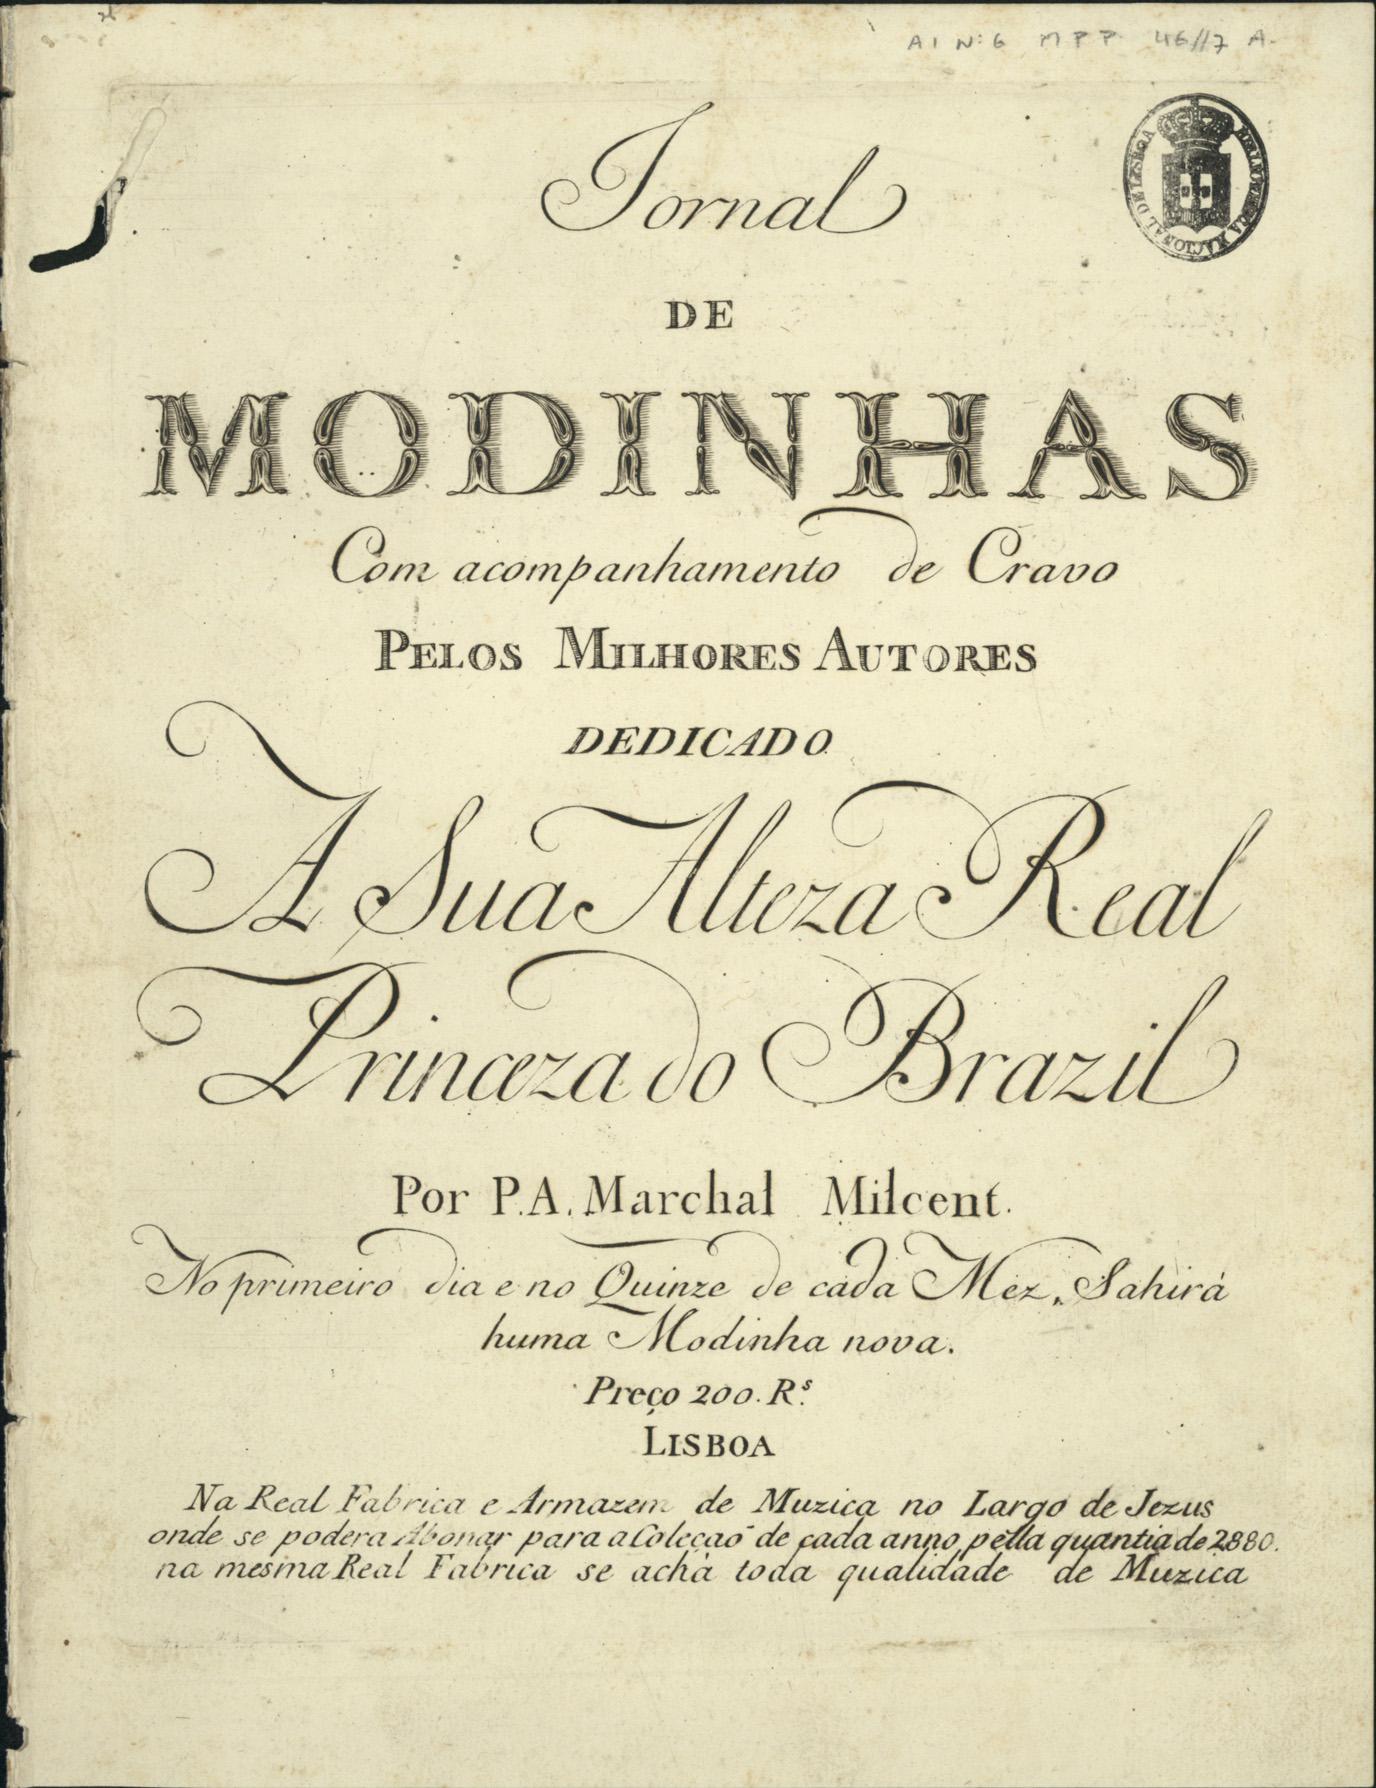 PORTUGAL,Marcos,1762-1830<br/>Duetto / del Signor Marcos Antonio. - Lisboa : P. A. Marchal e Milcent,[1792]. - Partitura (3 p.) ; 32 cm. - (Jornal de modinhas ; Ano I, Nº 7)